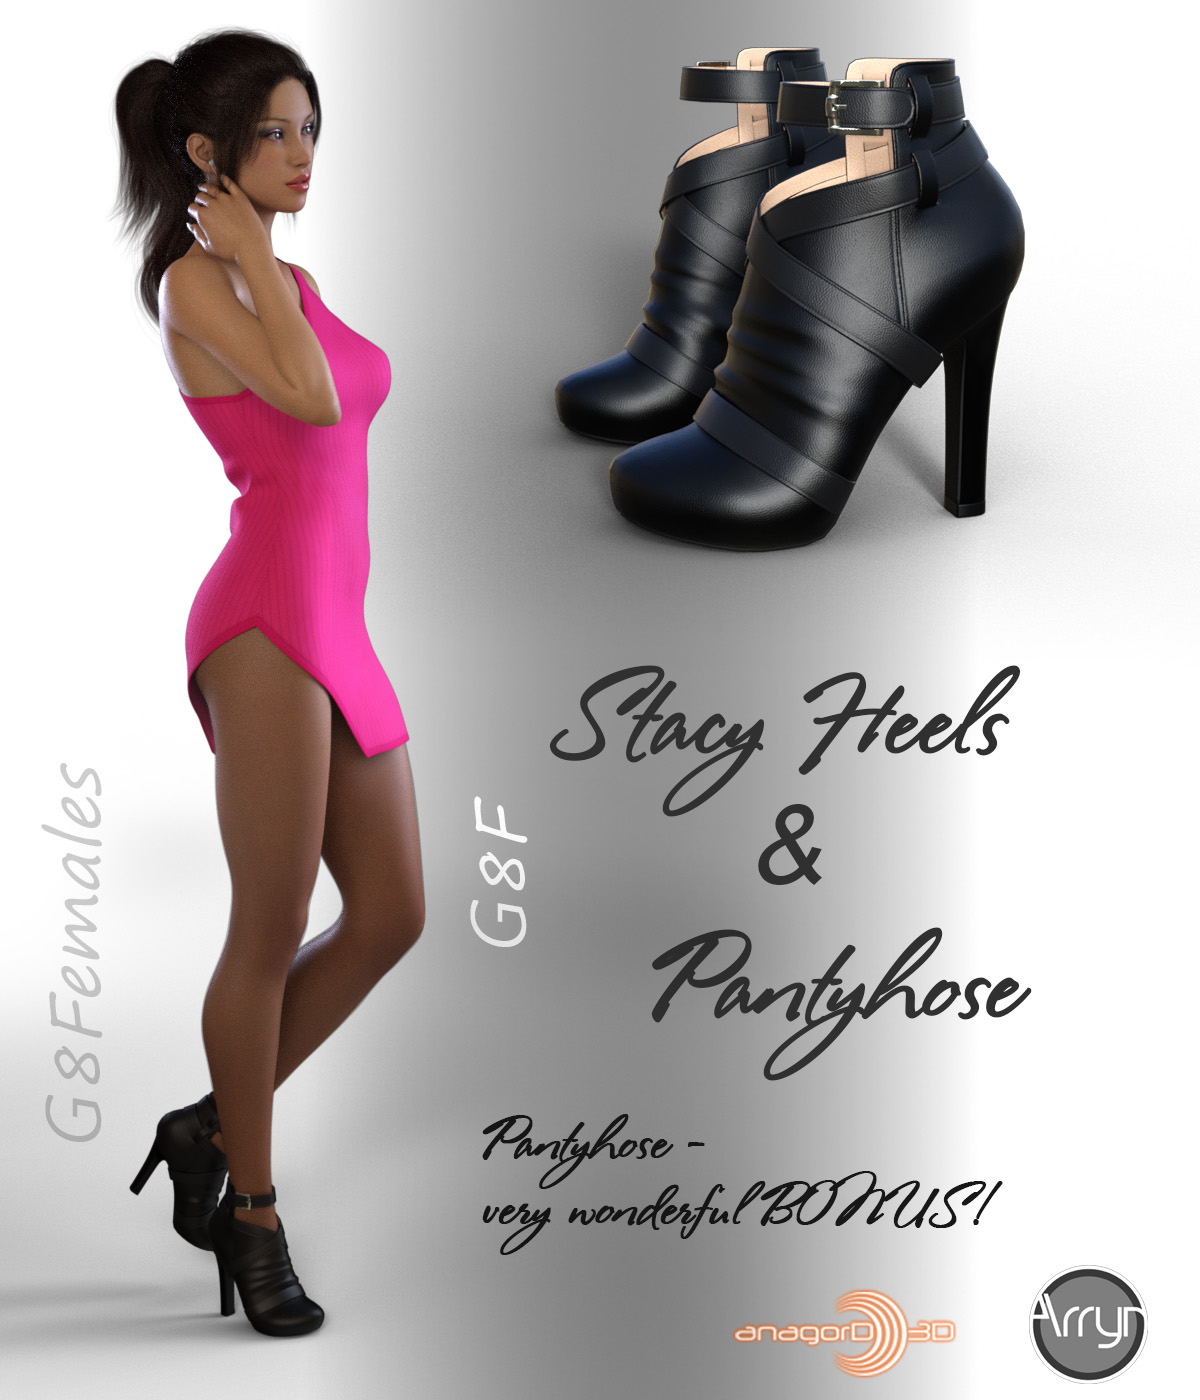 Stacy Heels and Pantyhose G8F_DAZ3D下载站